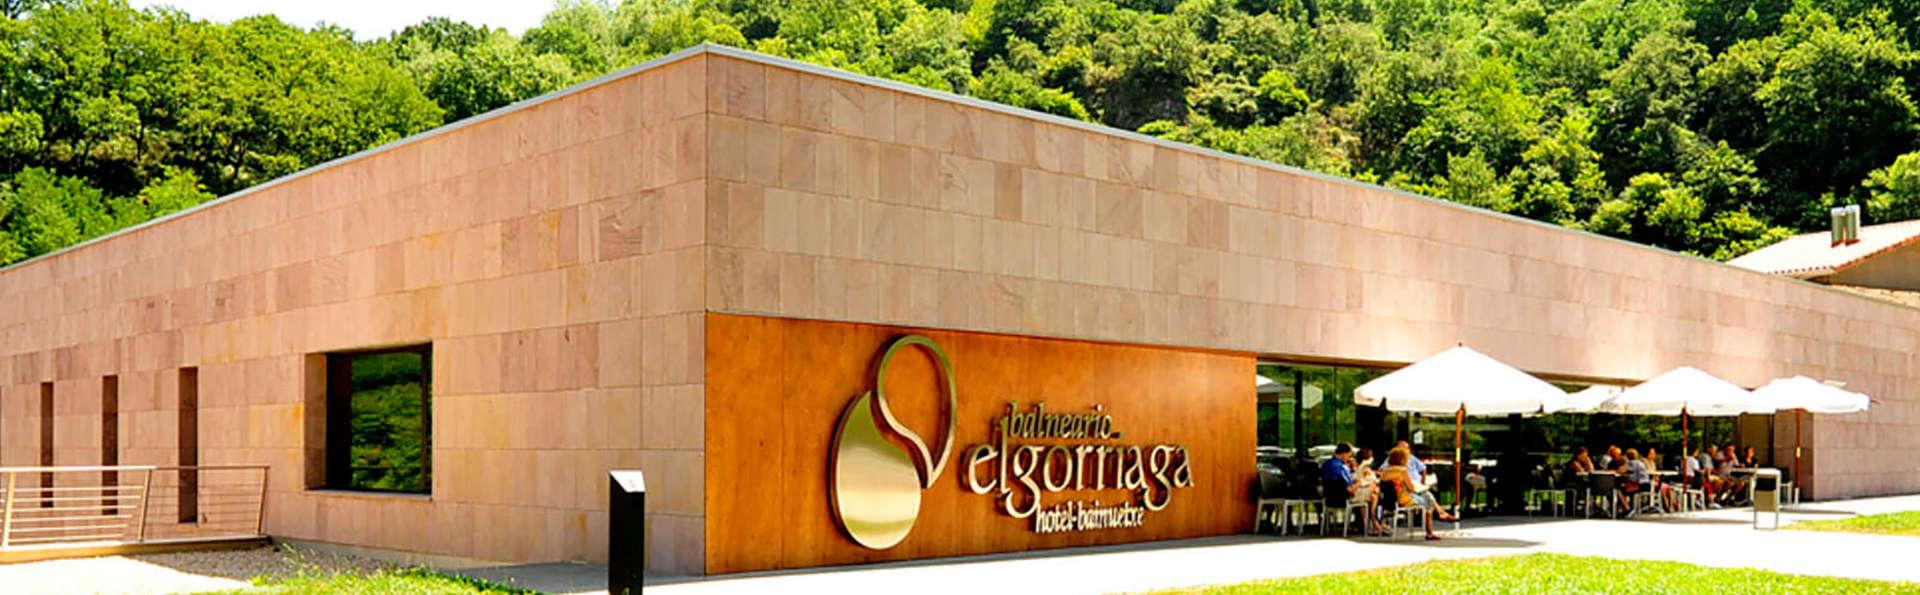 Balneario Elgorriaga - EDIT_front1.jpg